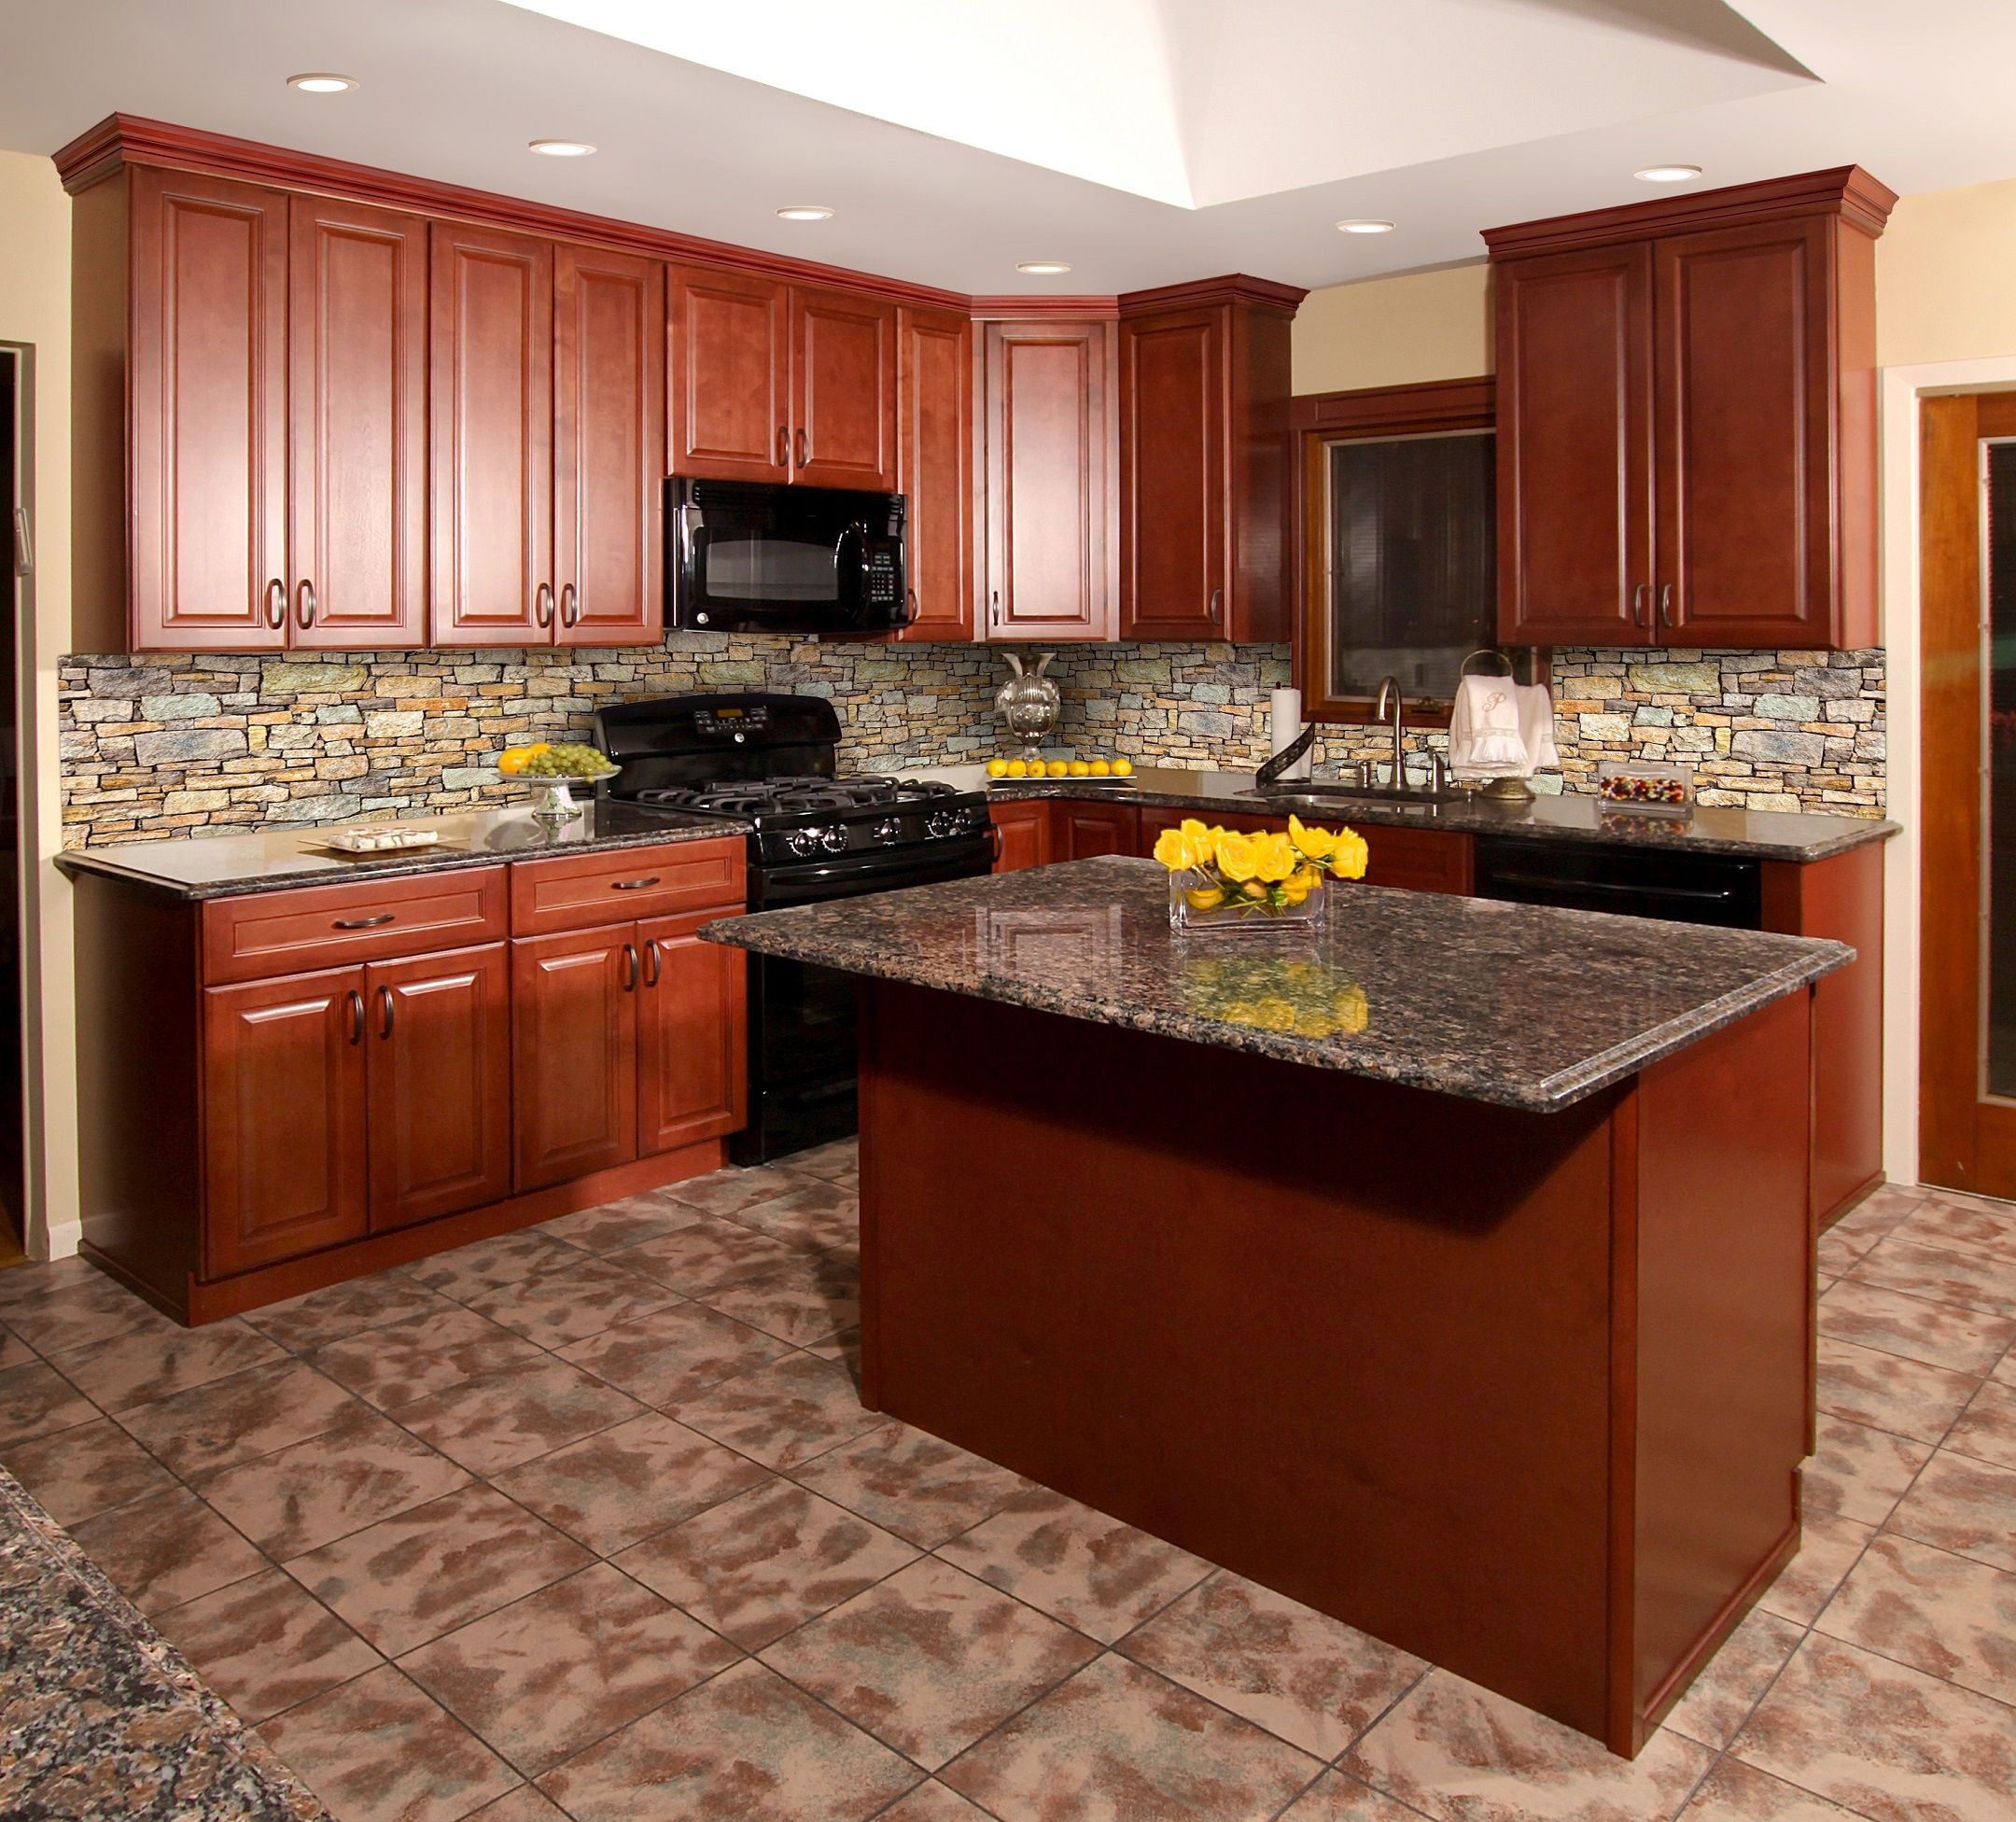 Hallmark Brandy Kitchen Vanity Shaker Kitchen Cabinets